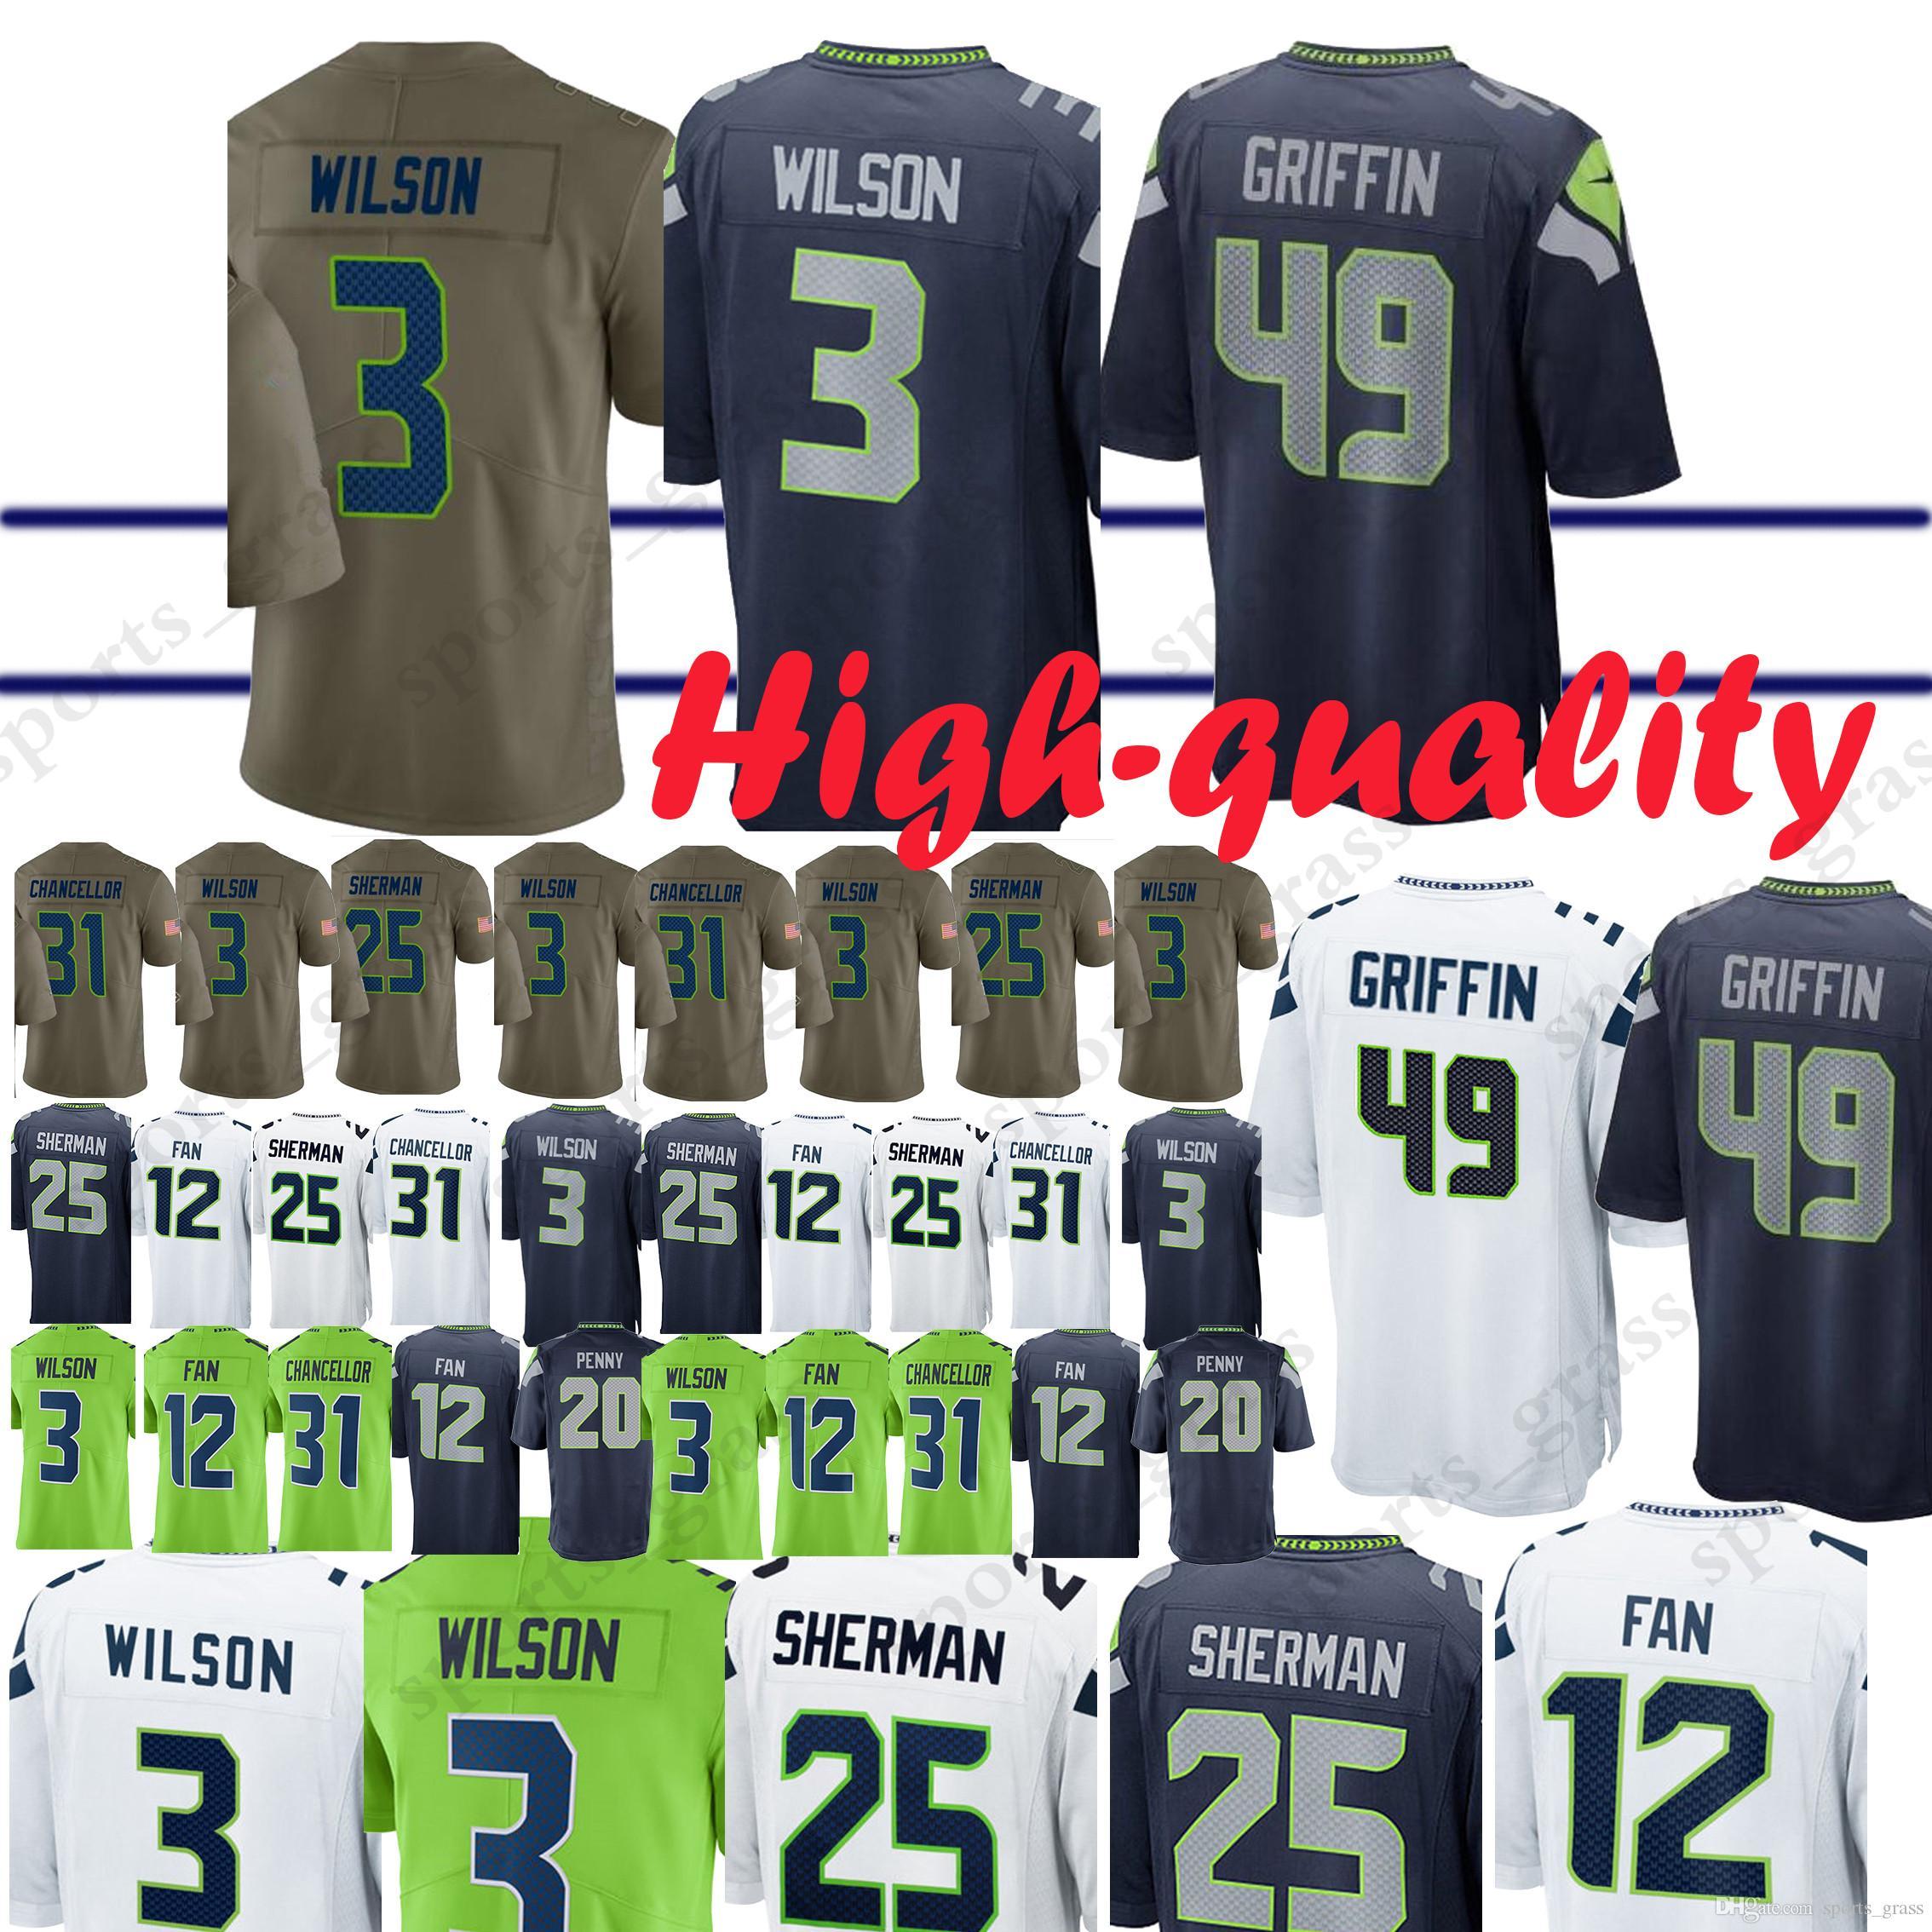 new styles 08527 da63f Seattle Seahawk Jerseys 49 Shaquem Griffin 20 Rashaad Penny 3 Russell  Wilson 12 Fan 29 Earl Thomas 31 Kam Chancellor Jersey Adult shirt